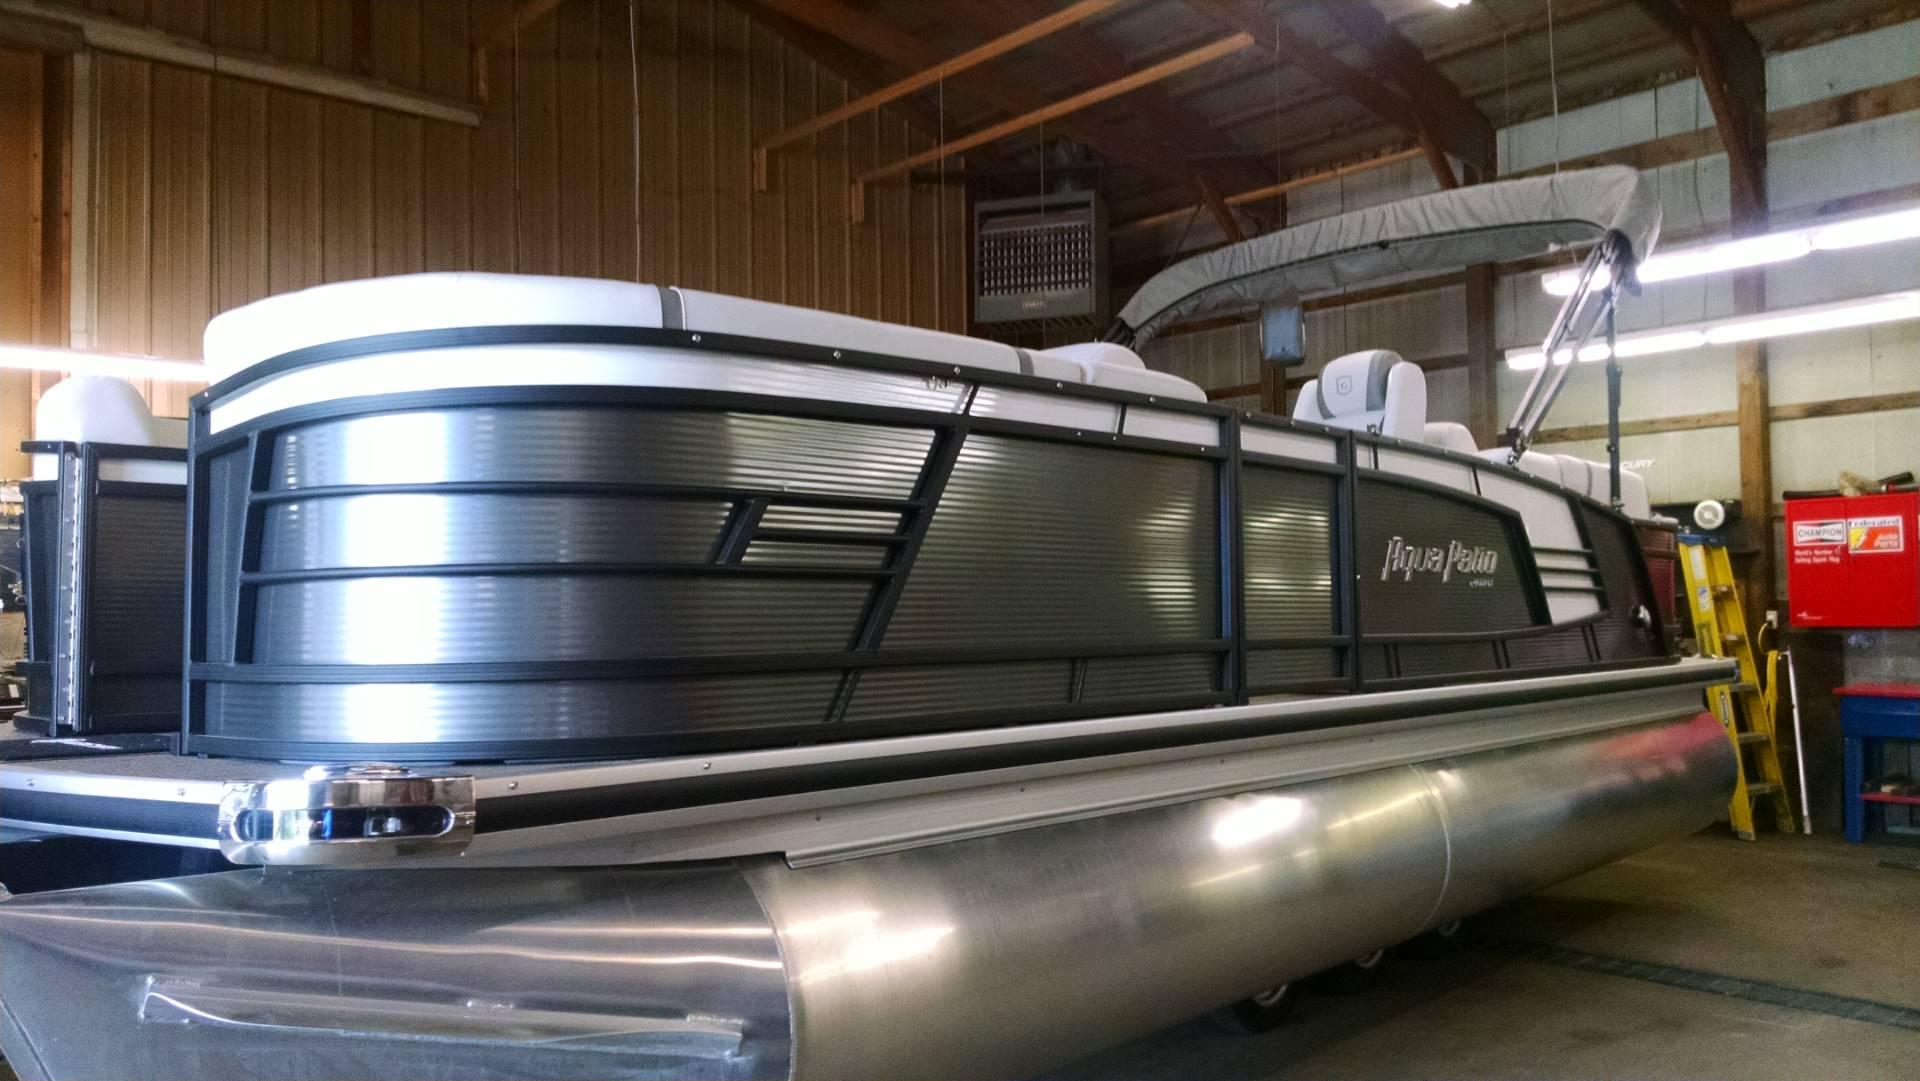 New 2017 Aqua Patio 235 SB Power Boats Outboard in Kalamazoo MI